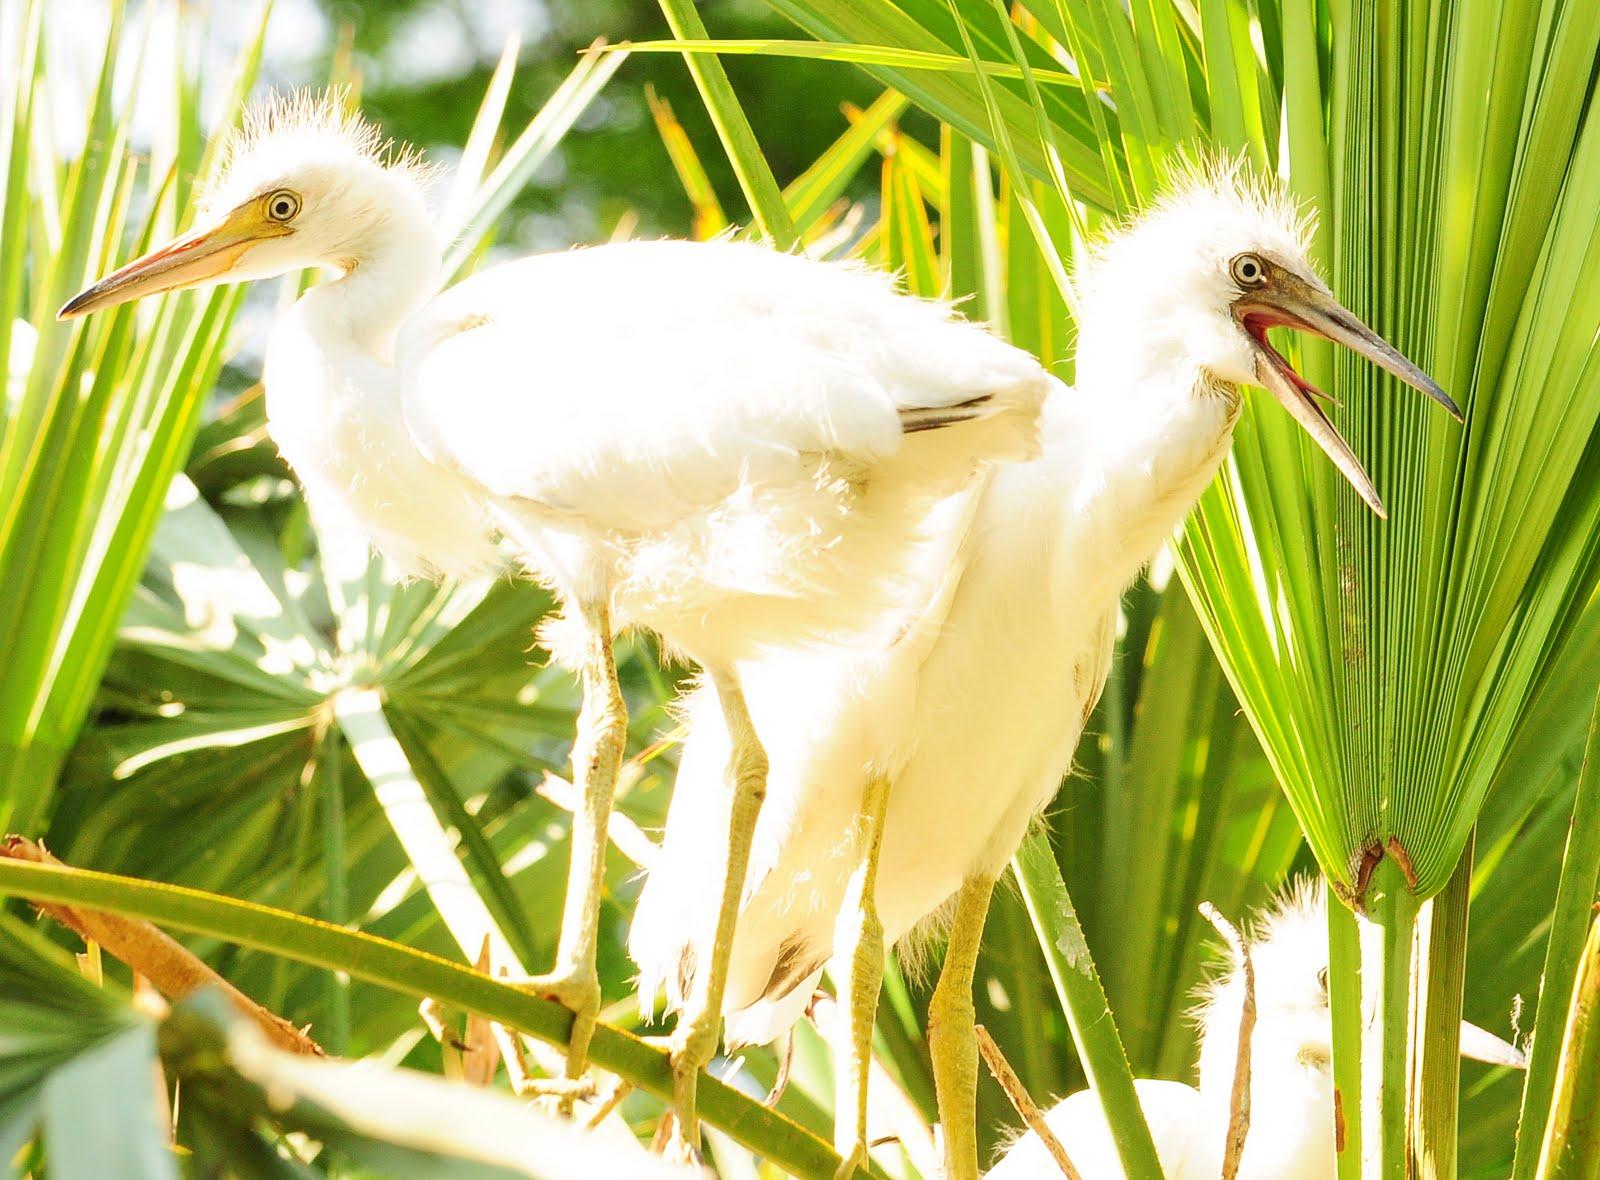 Baby blue heron bird - photo#28